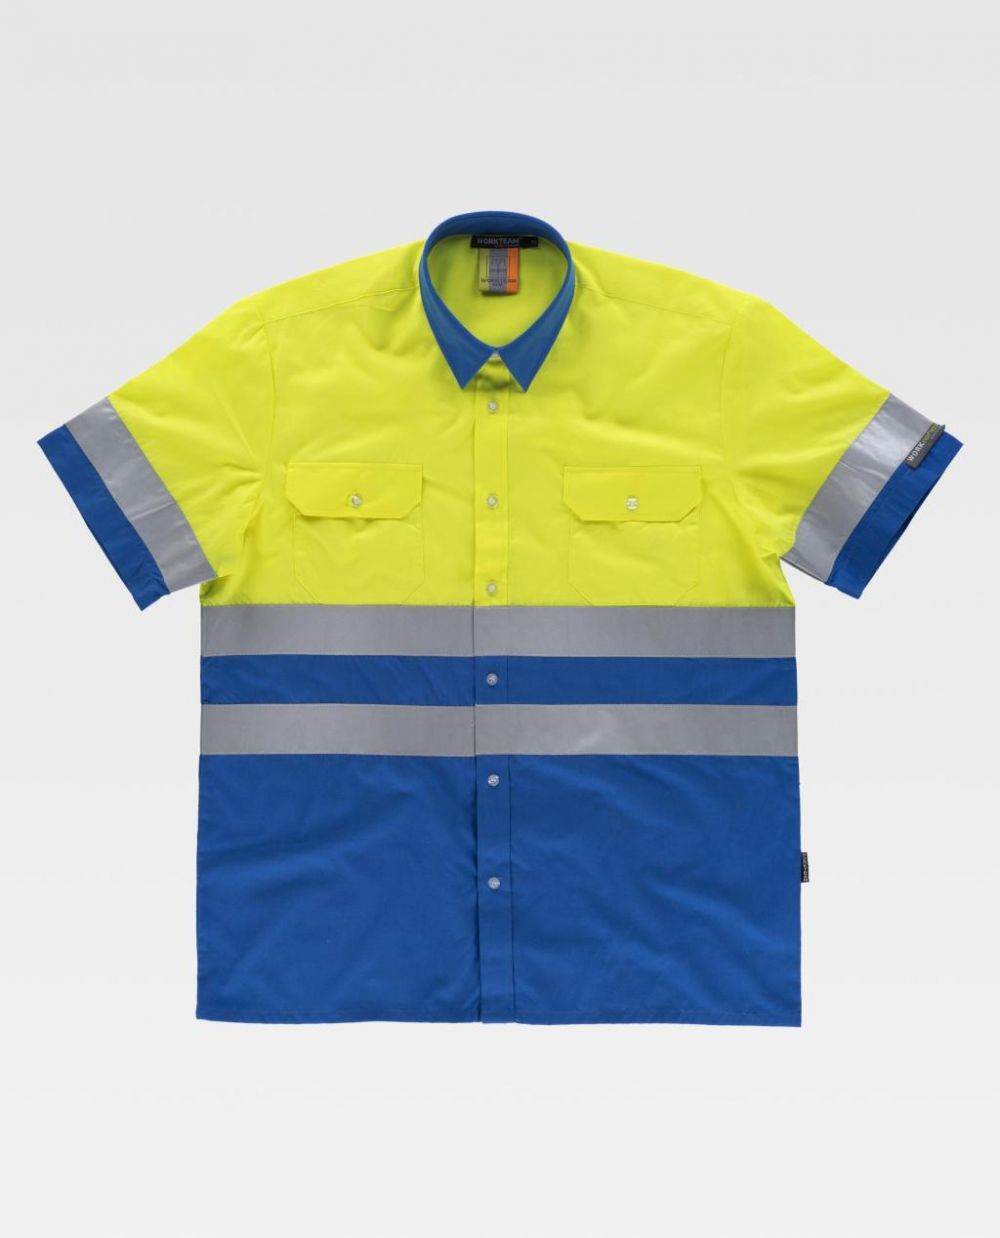 Camisas reflectante workteam mc de poliéster para personalizar vista 1